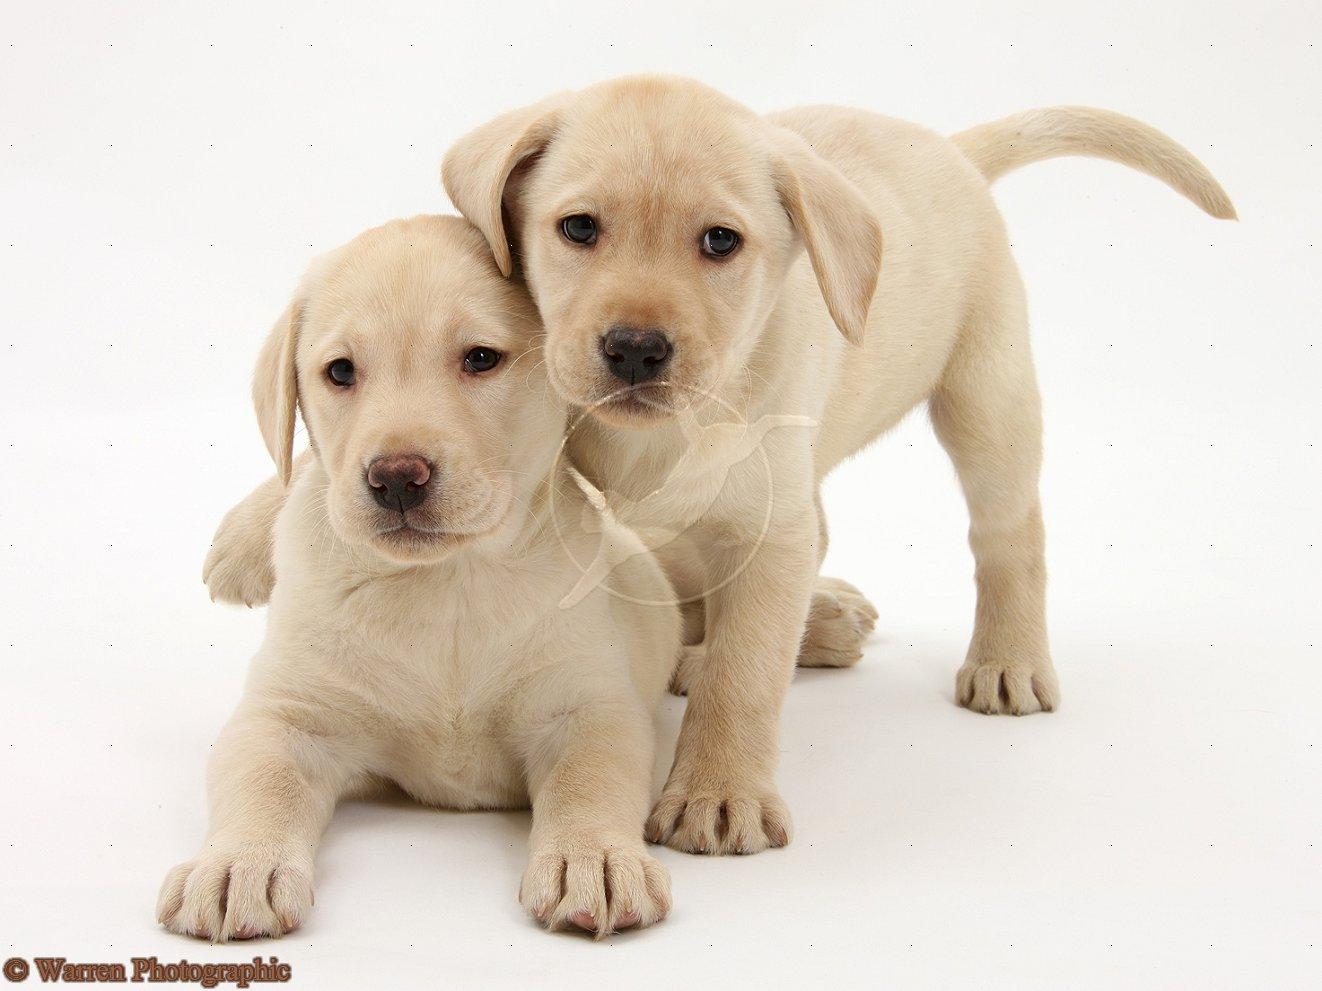 Cute Puppy Dogs Labrador Retriever Puppies